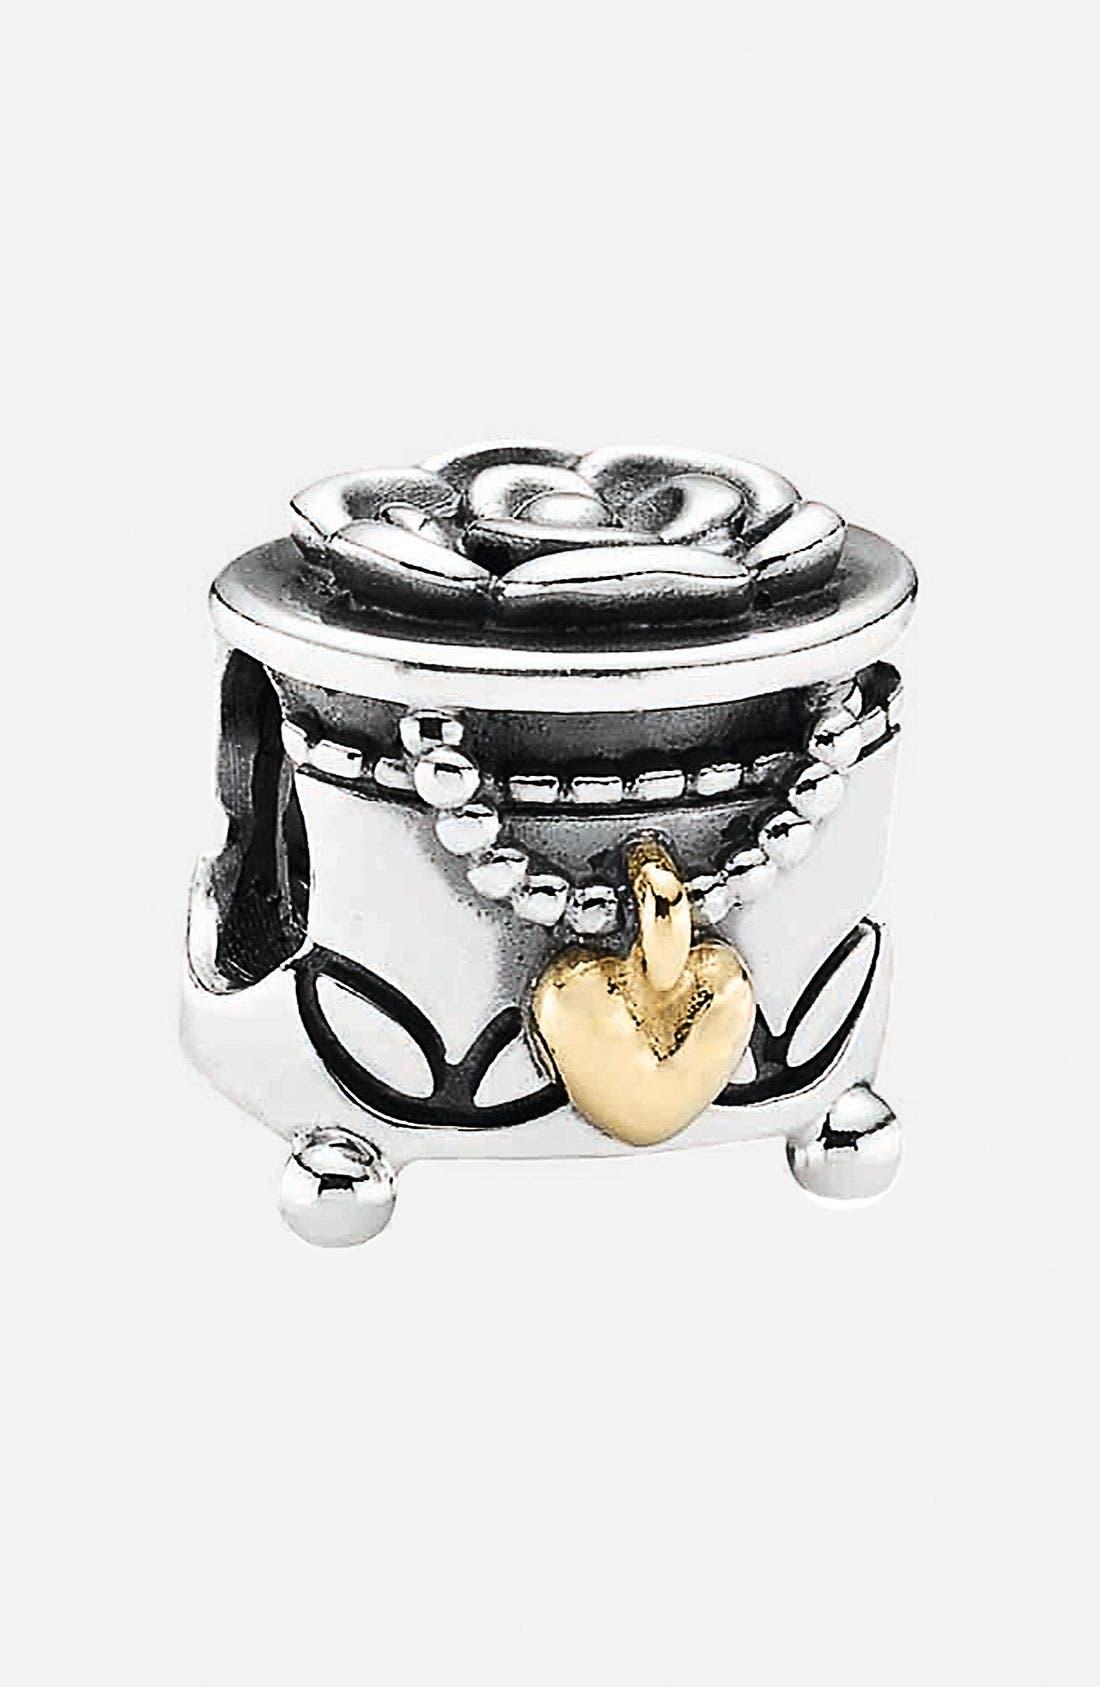 Alternate Image 1 Selected - PANDORA 'Pandora's Box' Charm